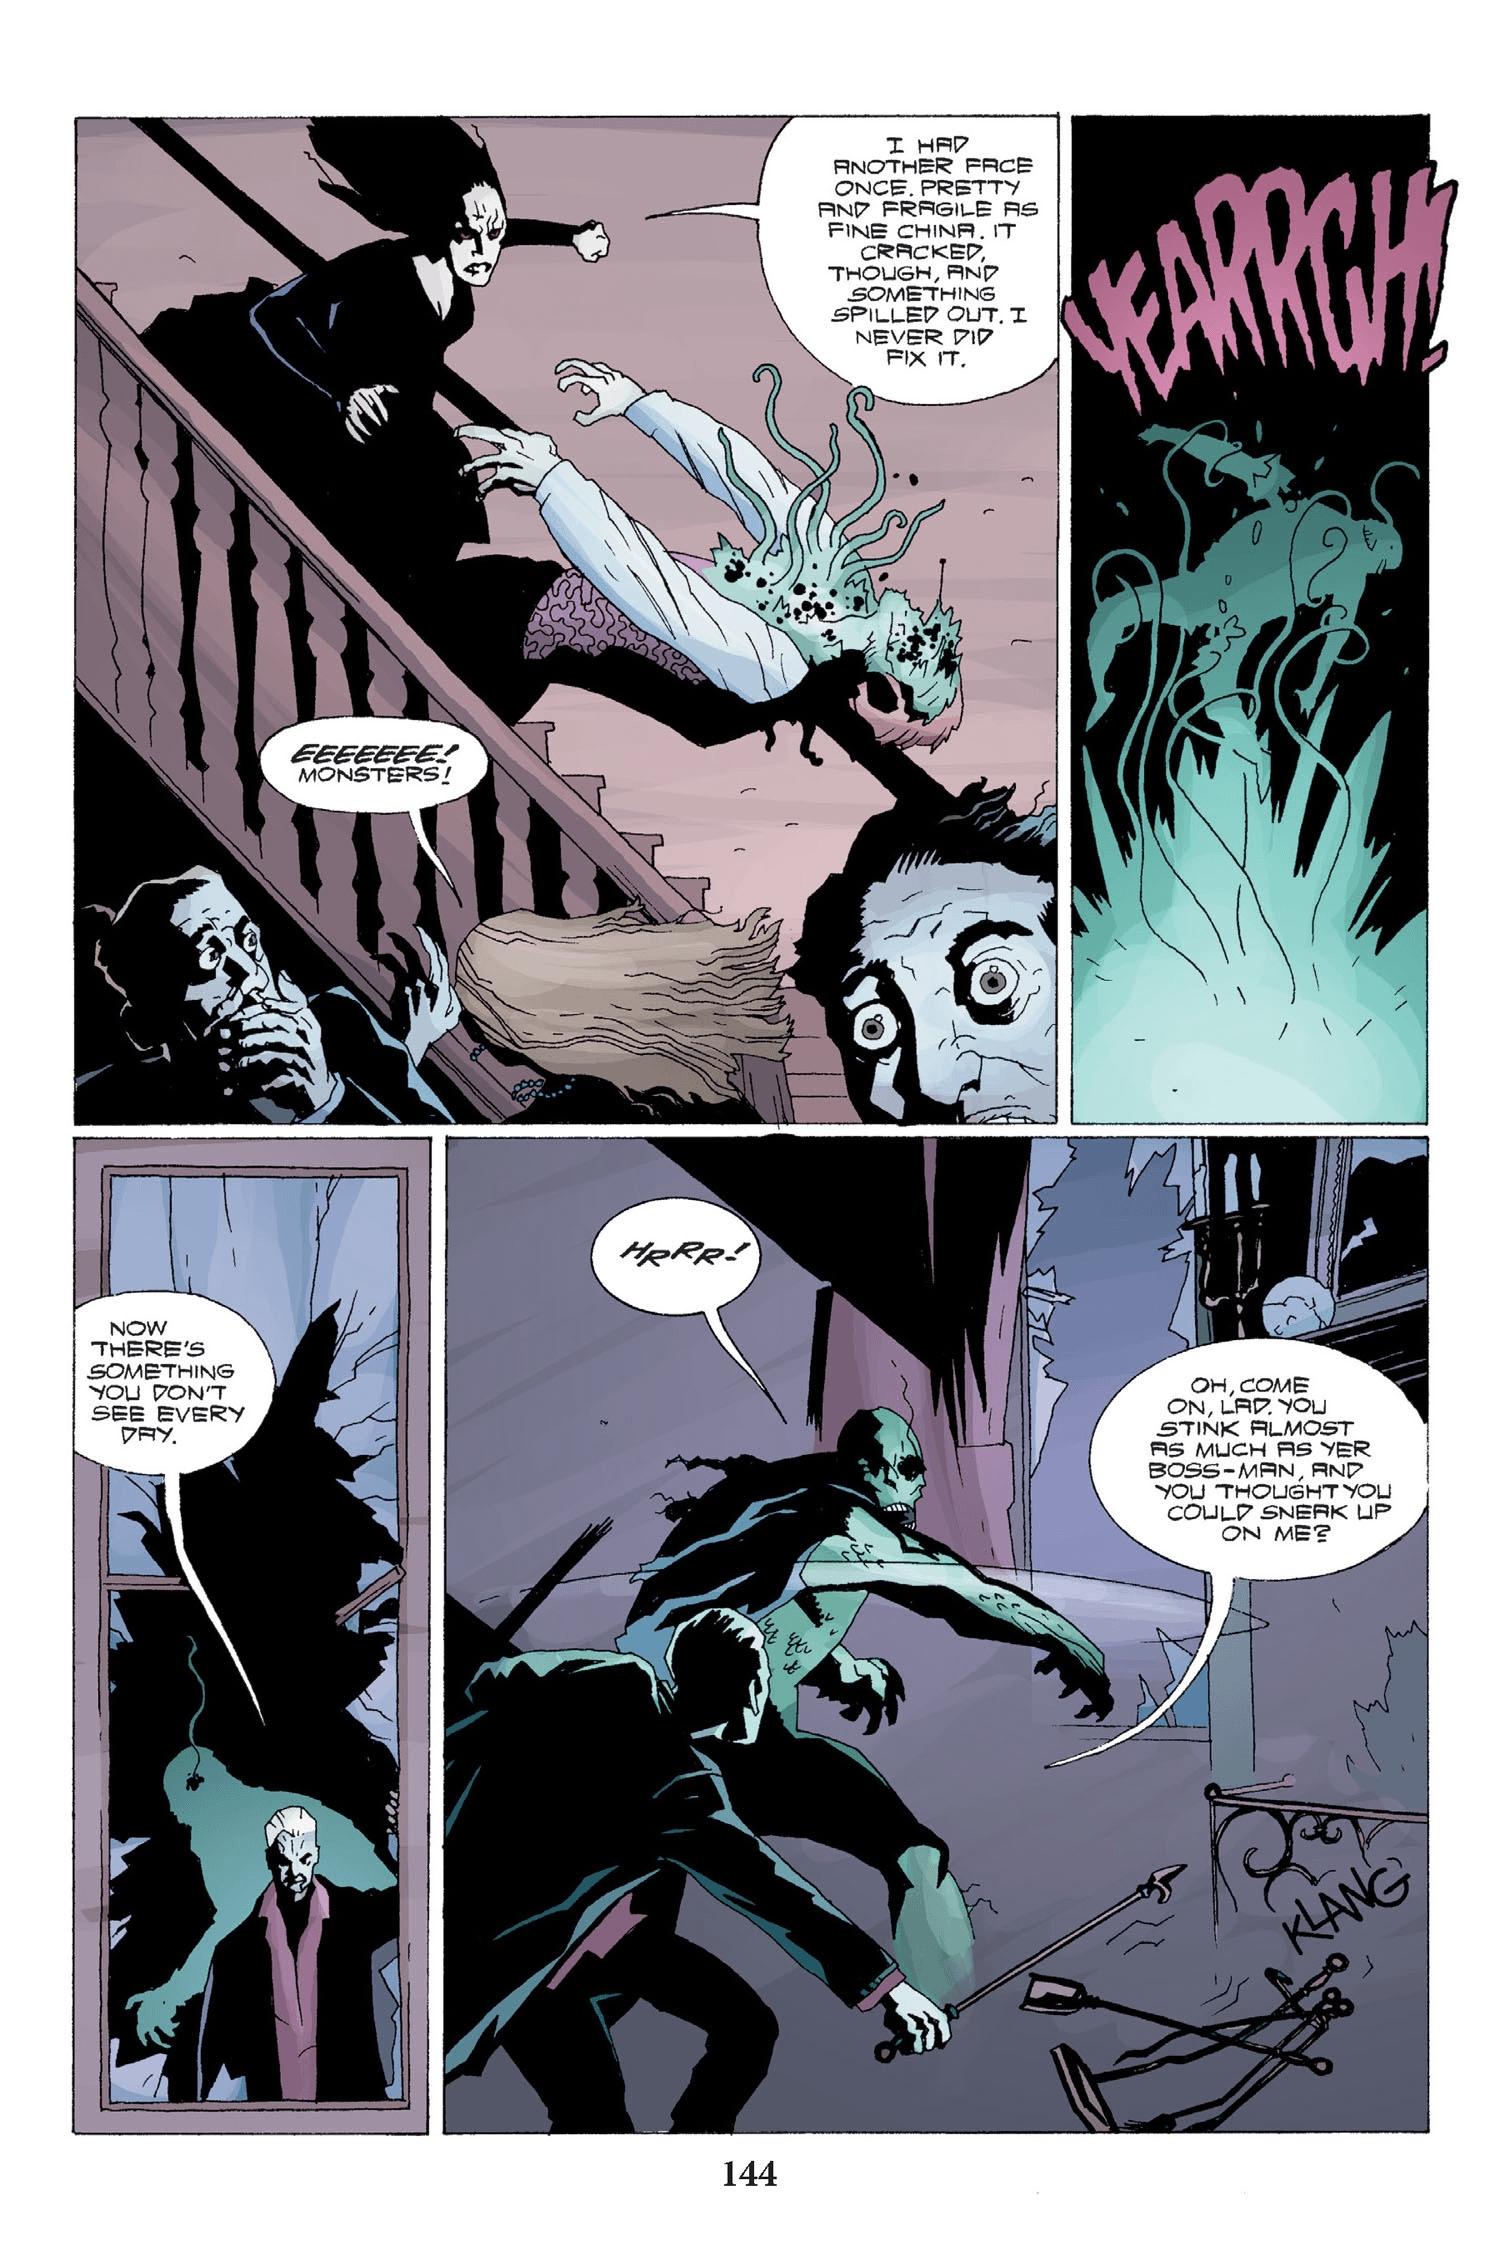 Read online Buffy the Vampire Slayer: Omnibus comic -  Issue # TPB 2 - 138